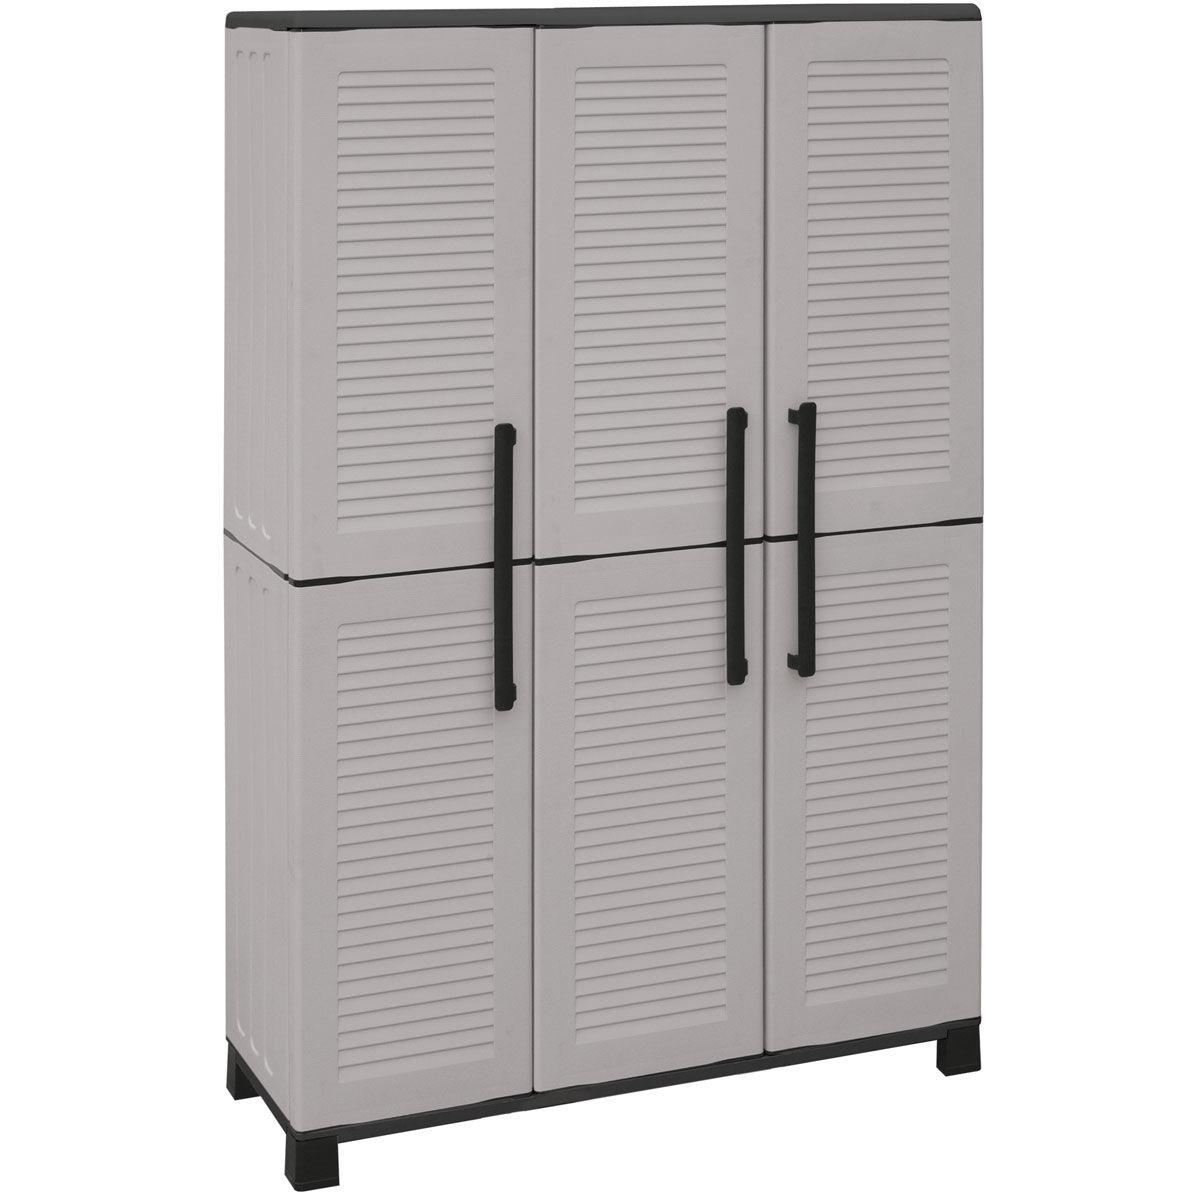 Armarios de pl stico con estantes regulables for Armarios de almacenaje para exterior